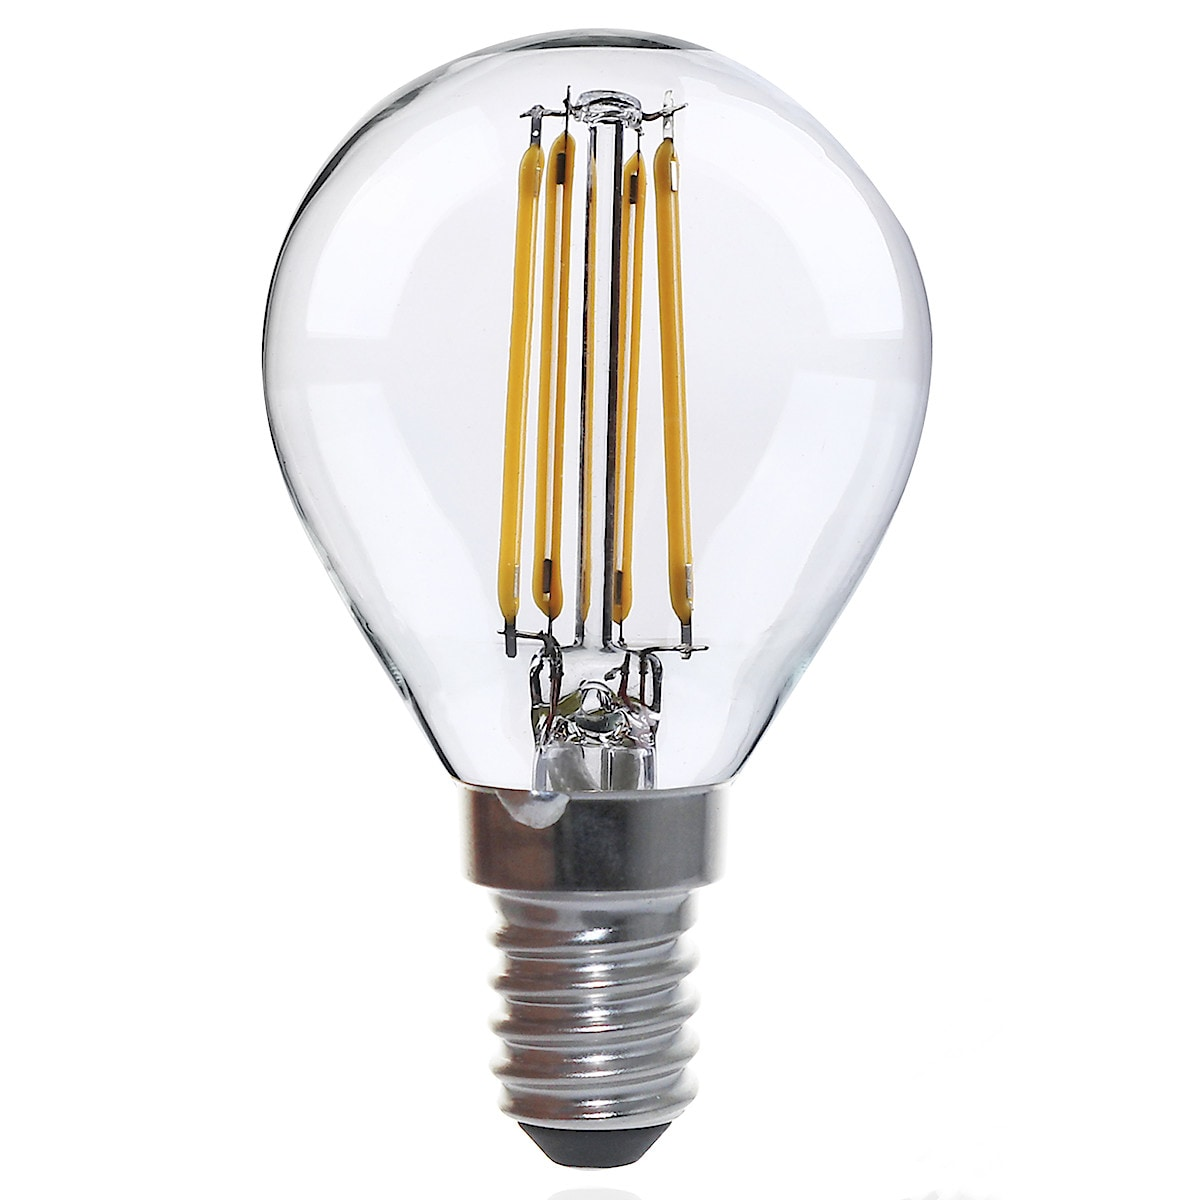 Dimbar klotlampa LED E14 Clas Ohlson